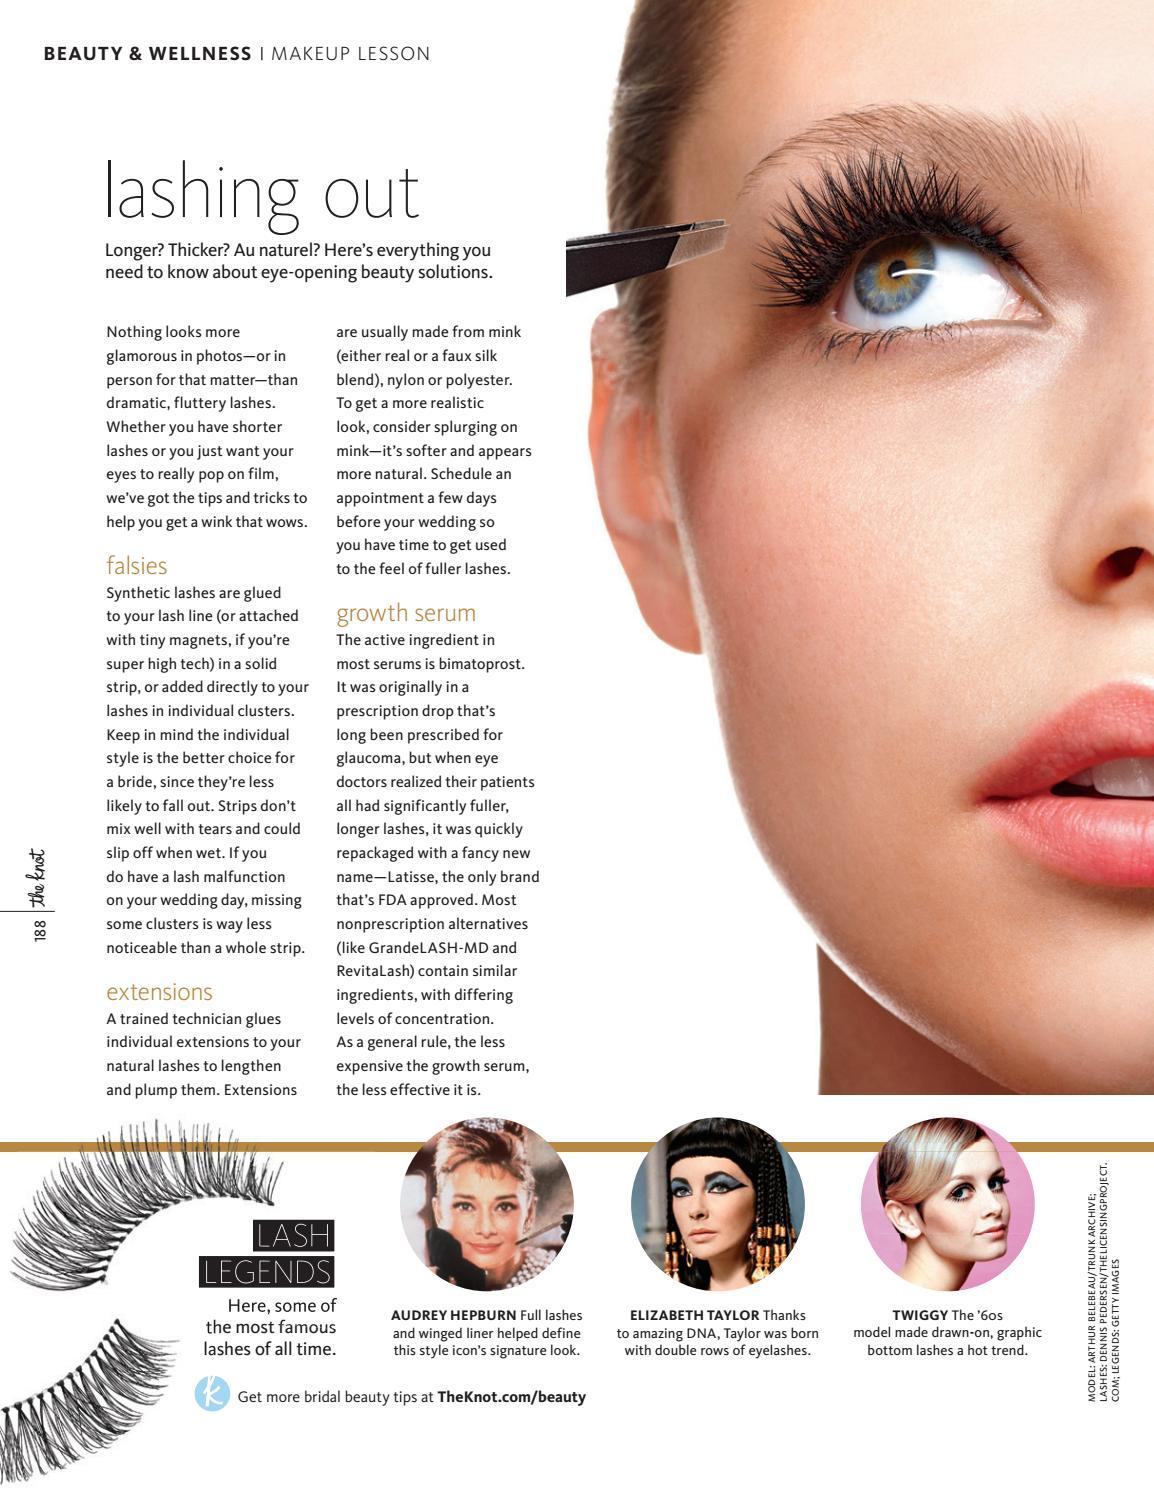 Audrey hepburn makeup tips emo makeup audrey hepburn makeup tutorial breakfast at tiffany s beauty cat eye eyeliner source we baditri Gallery